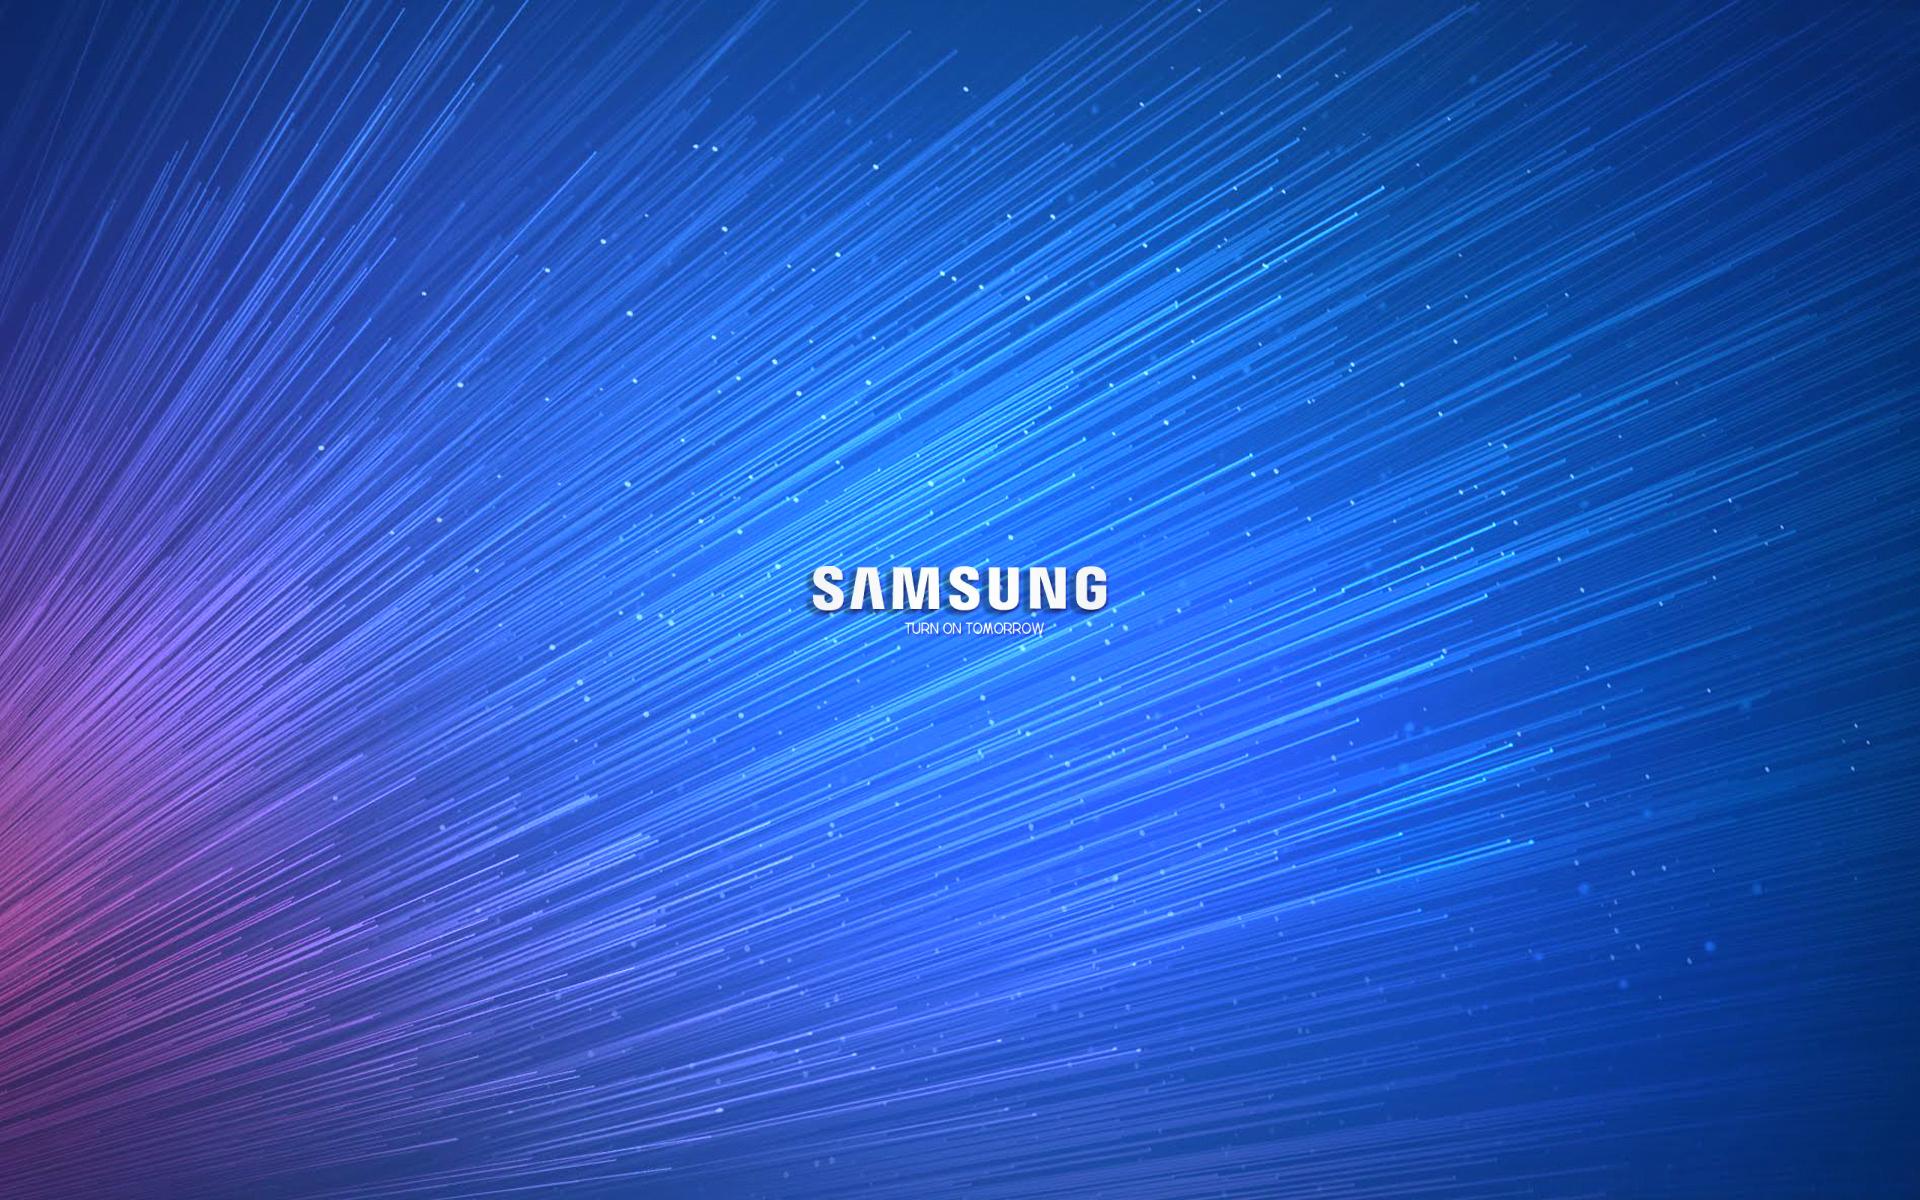 Oboi Samsung 2877674 Hd Wallpaper Backgrounds Download